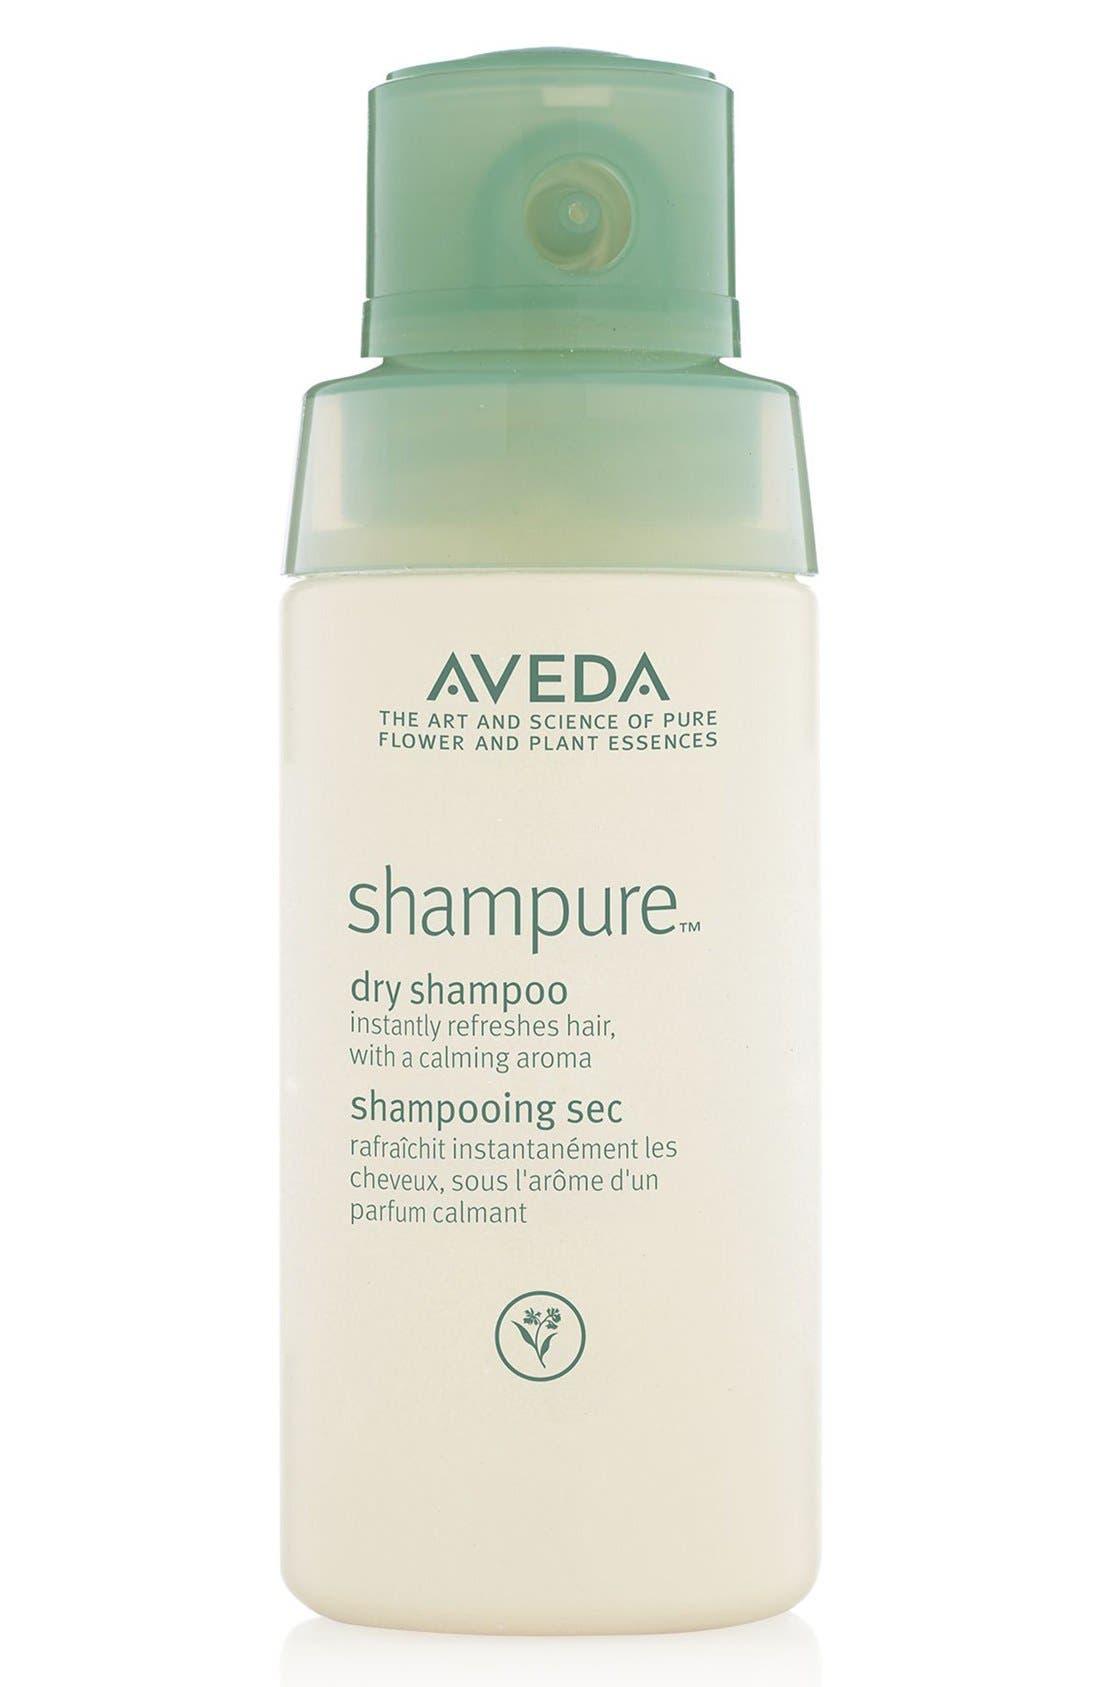 Aveda 'shampure™' Dry Shampoo